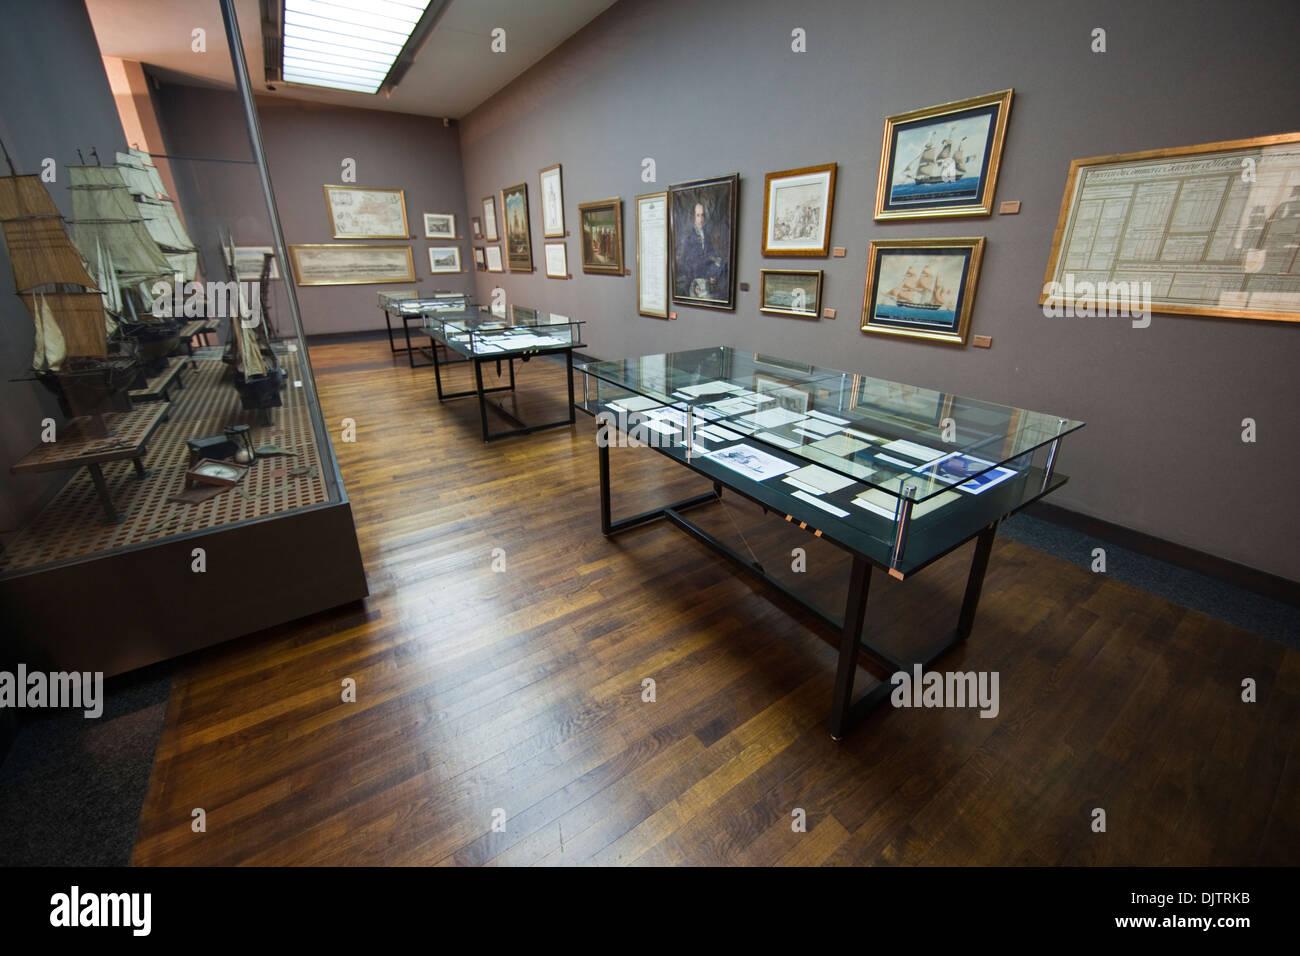 Chambre de commerce de marseille c c i m marseille chamber of stock photo royalty free - Chambre des commerce marseille ...